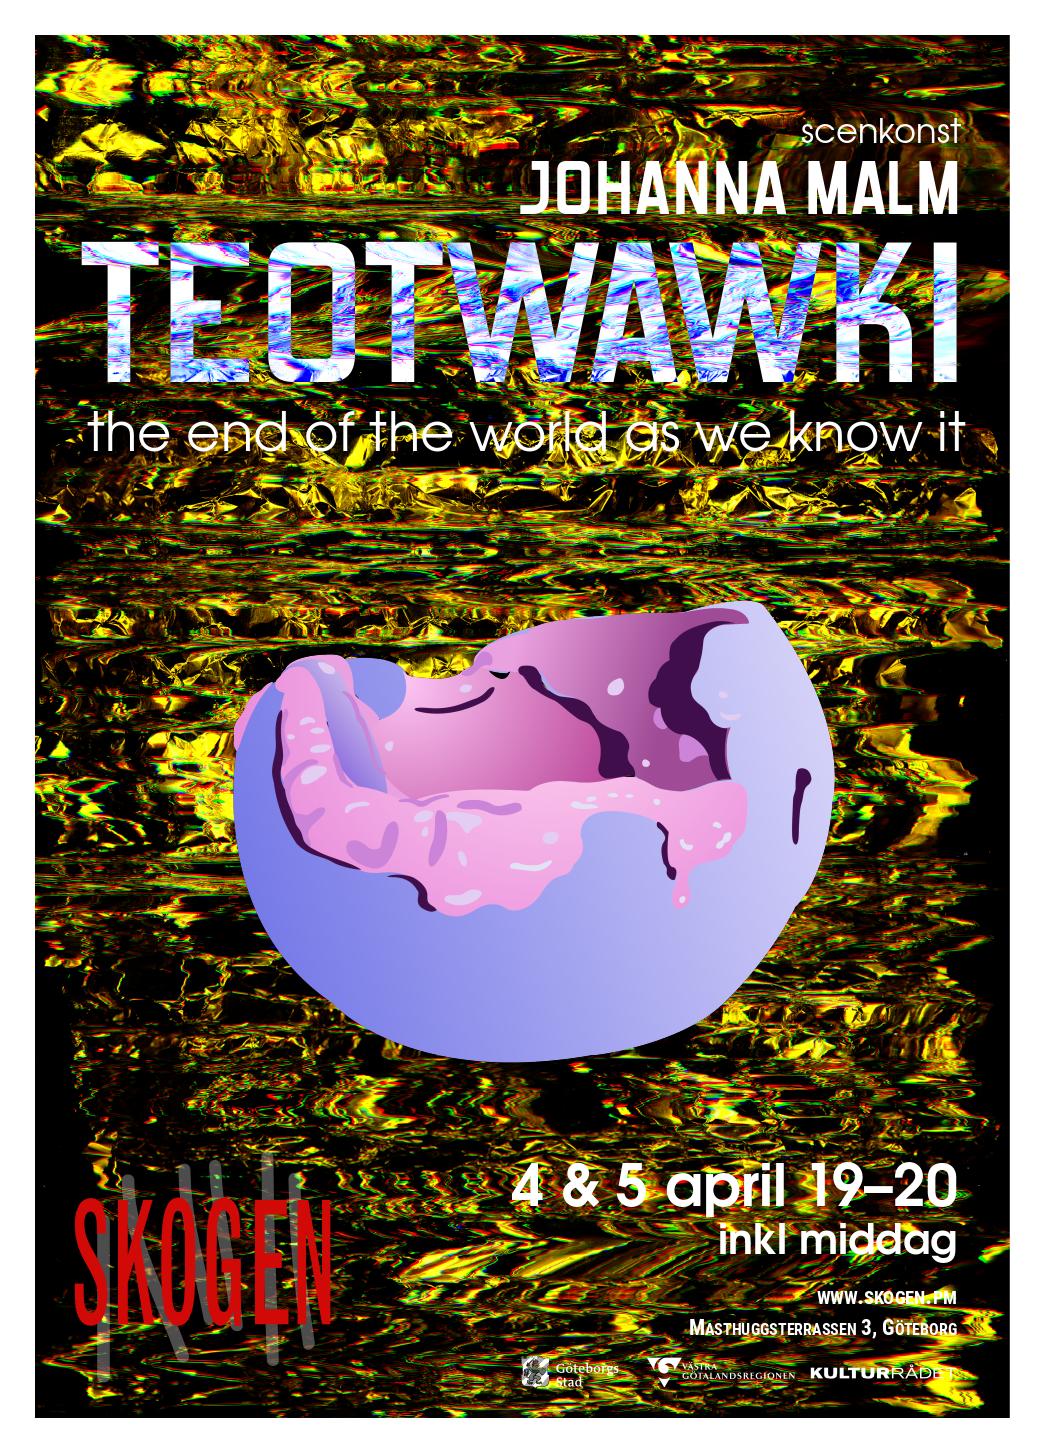 Skogen Teotwawki april 4-5 (1).png